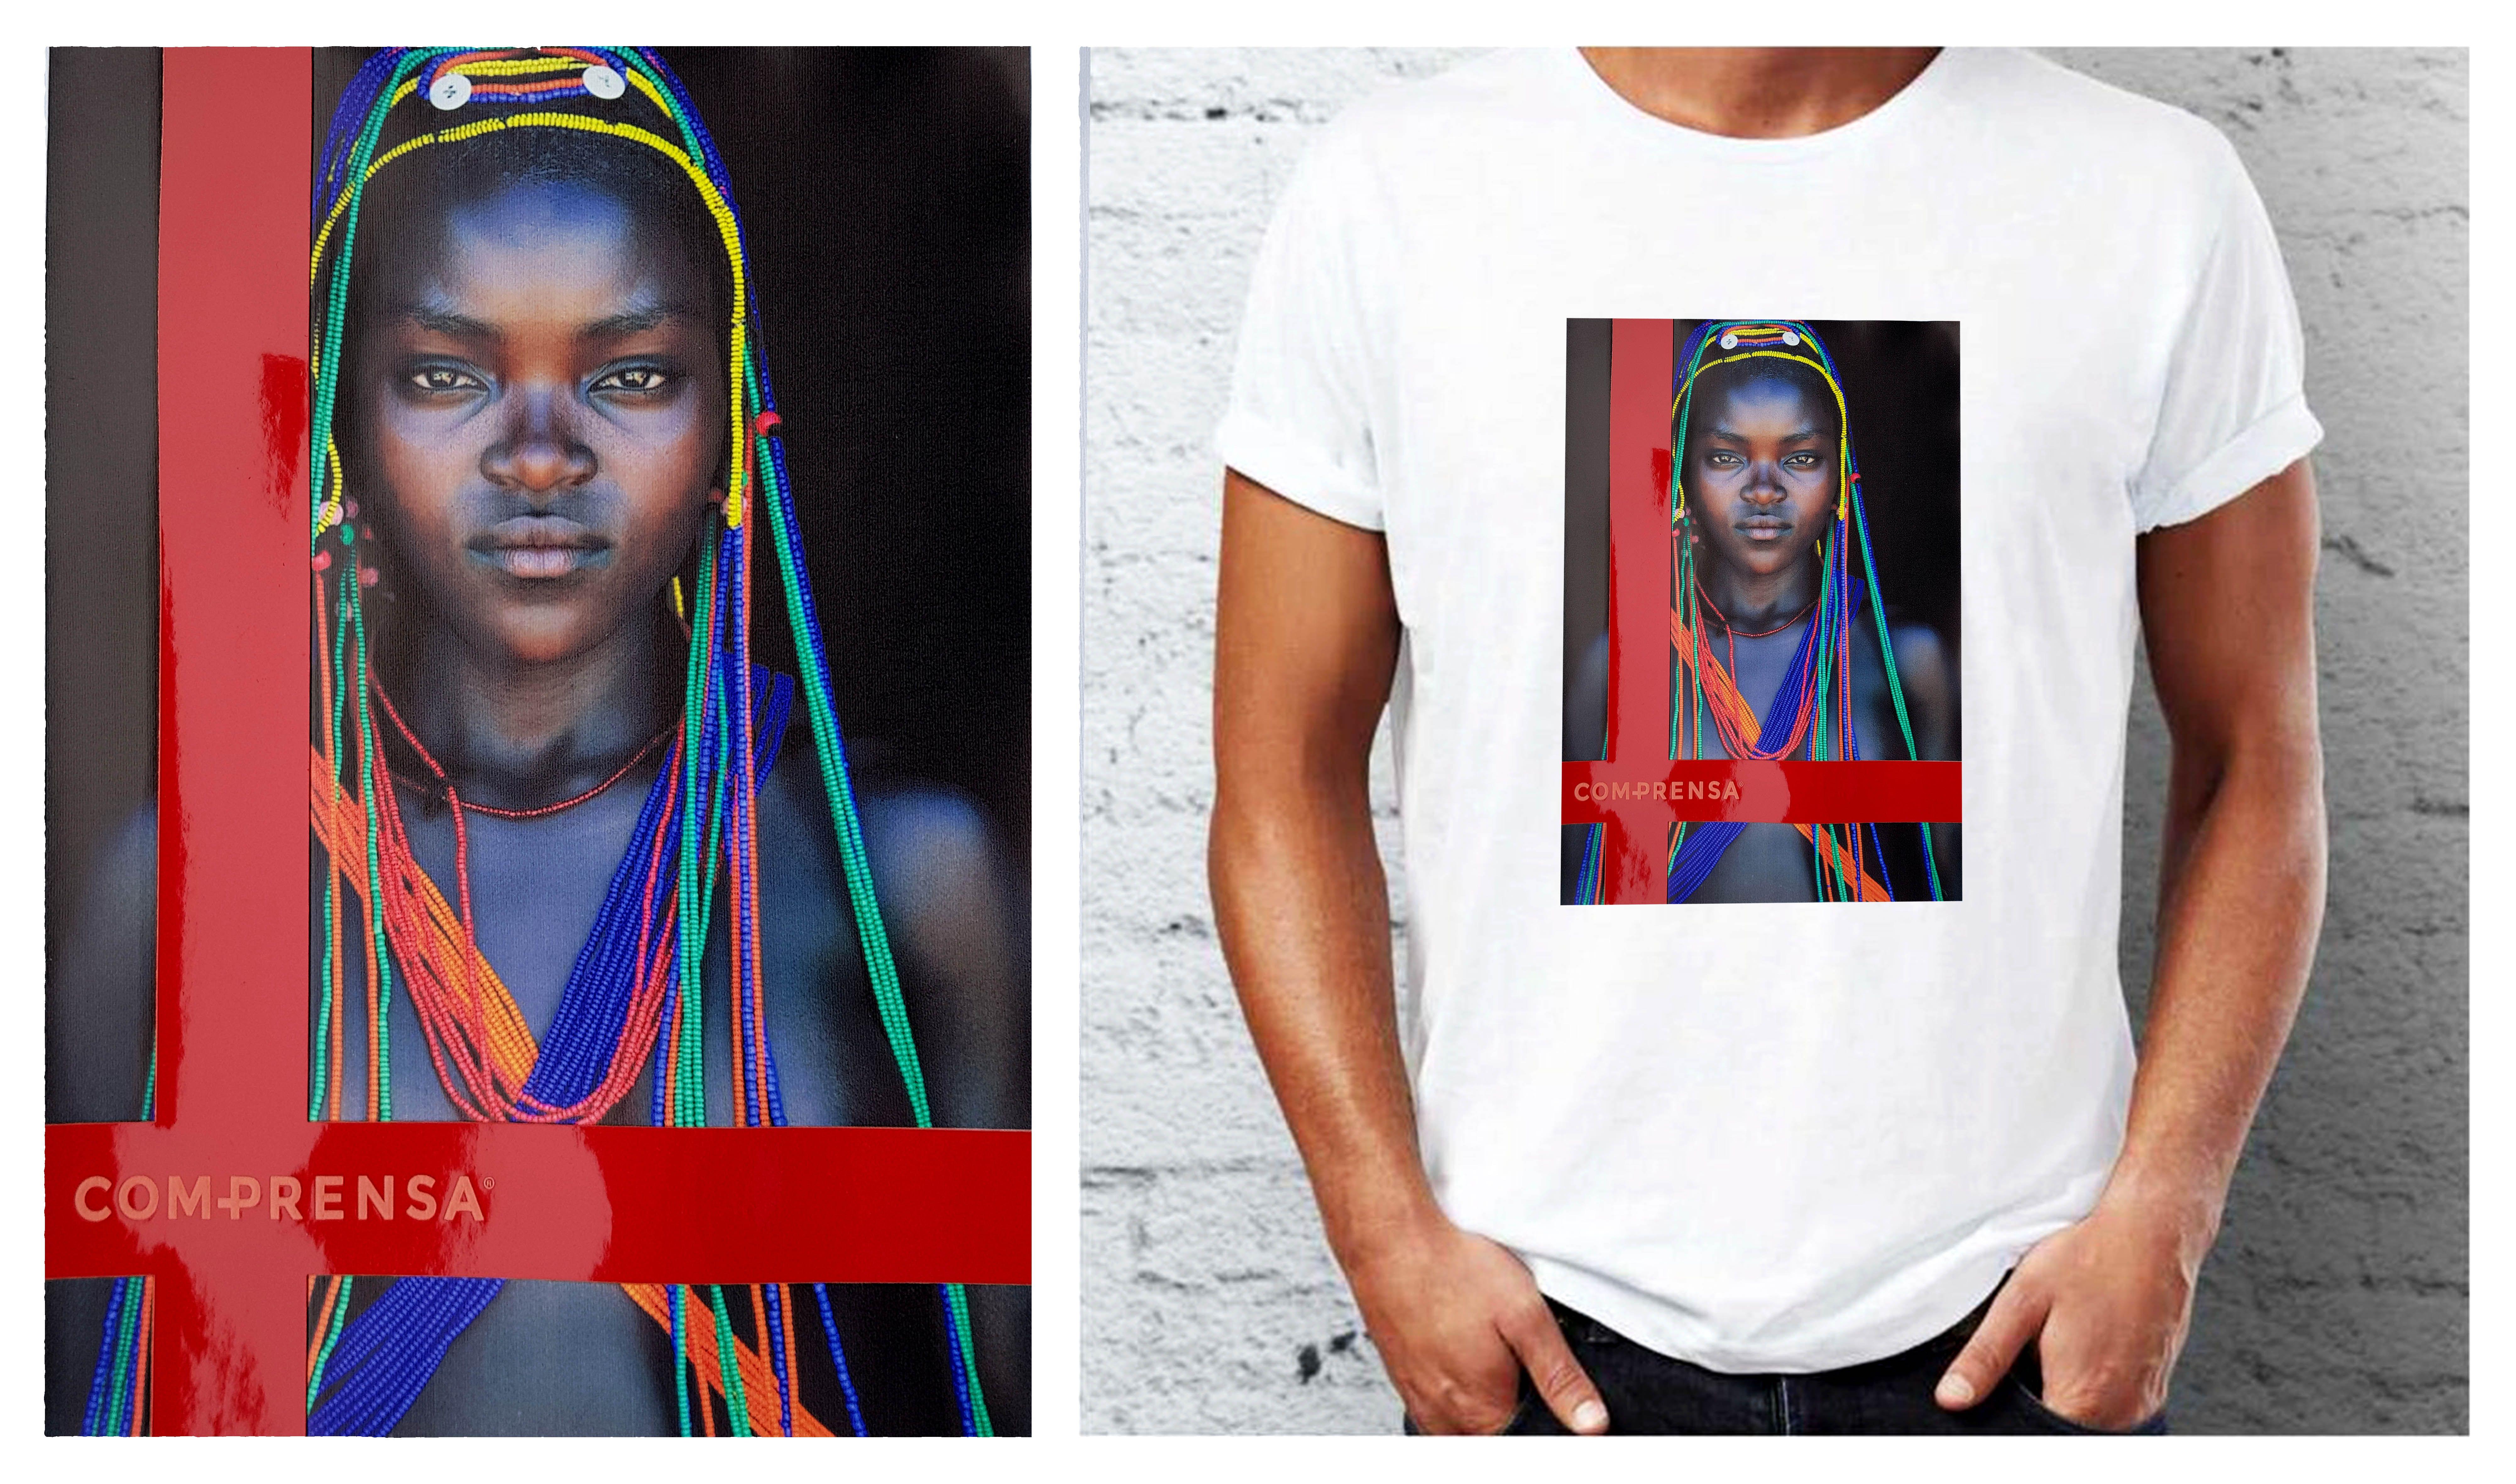 Our T-Shirt with Mumuhuila Woman  #comprensa #Tshirt #tribo #woman #mumuhuila #africa #tribal #photo #tranfer #color